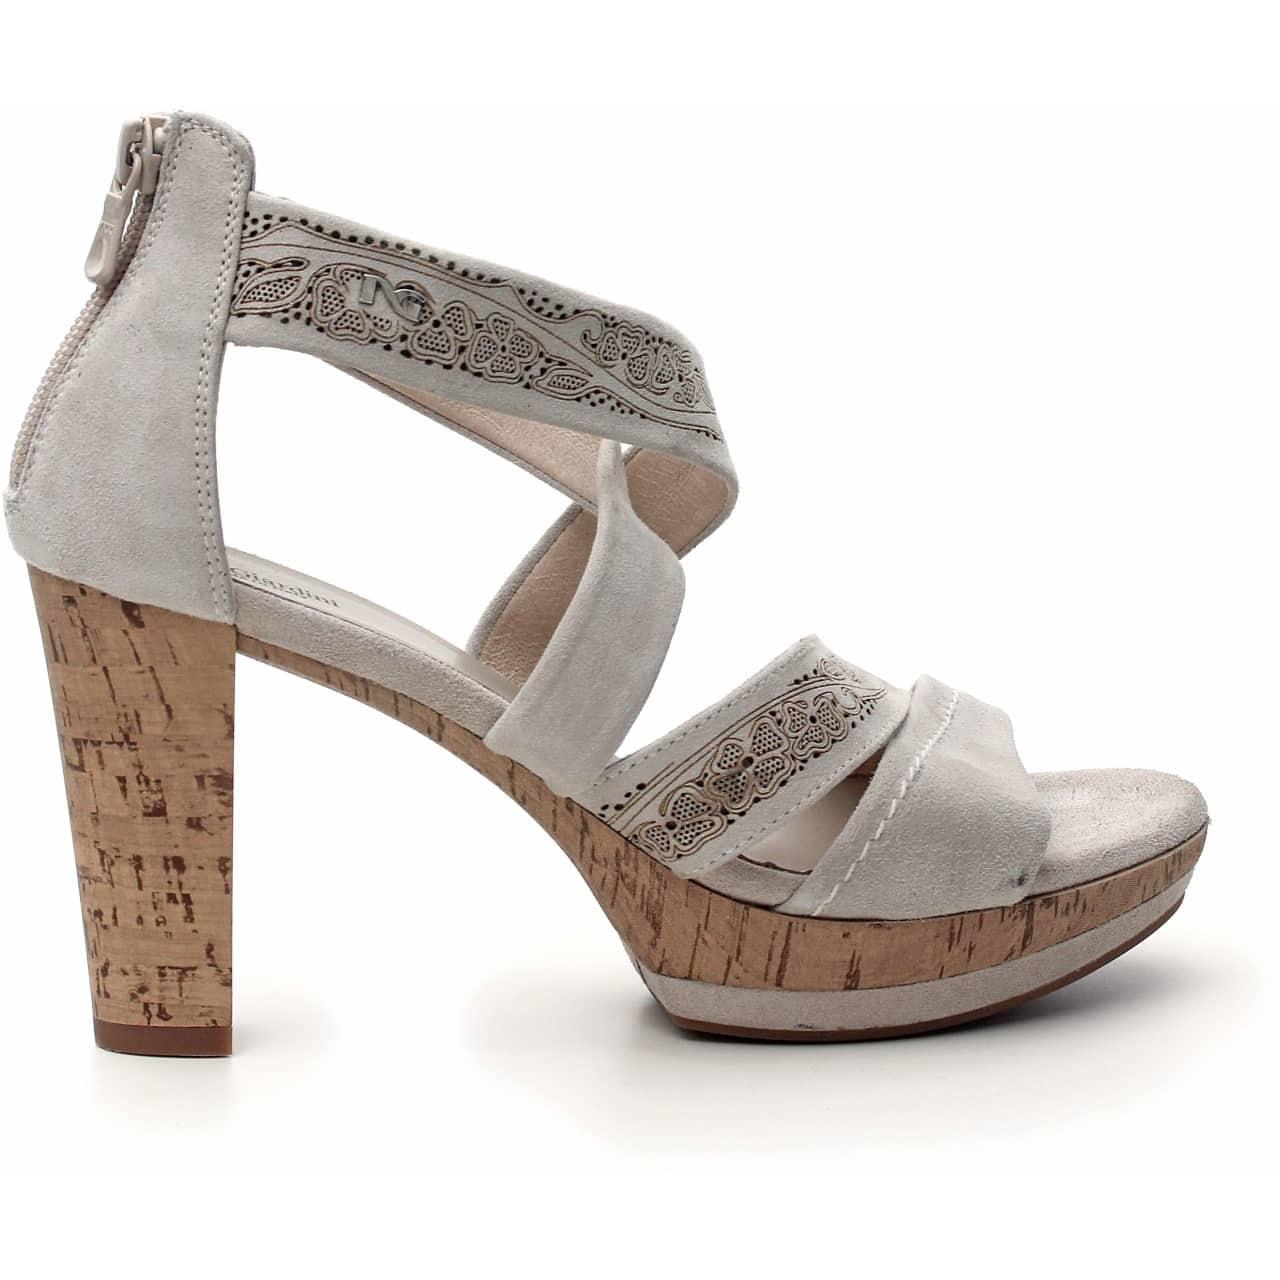 Nero Giardini sandalo tacco camoscio color ivory